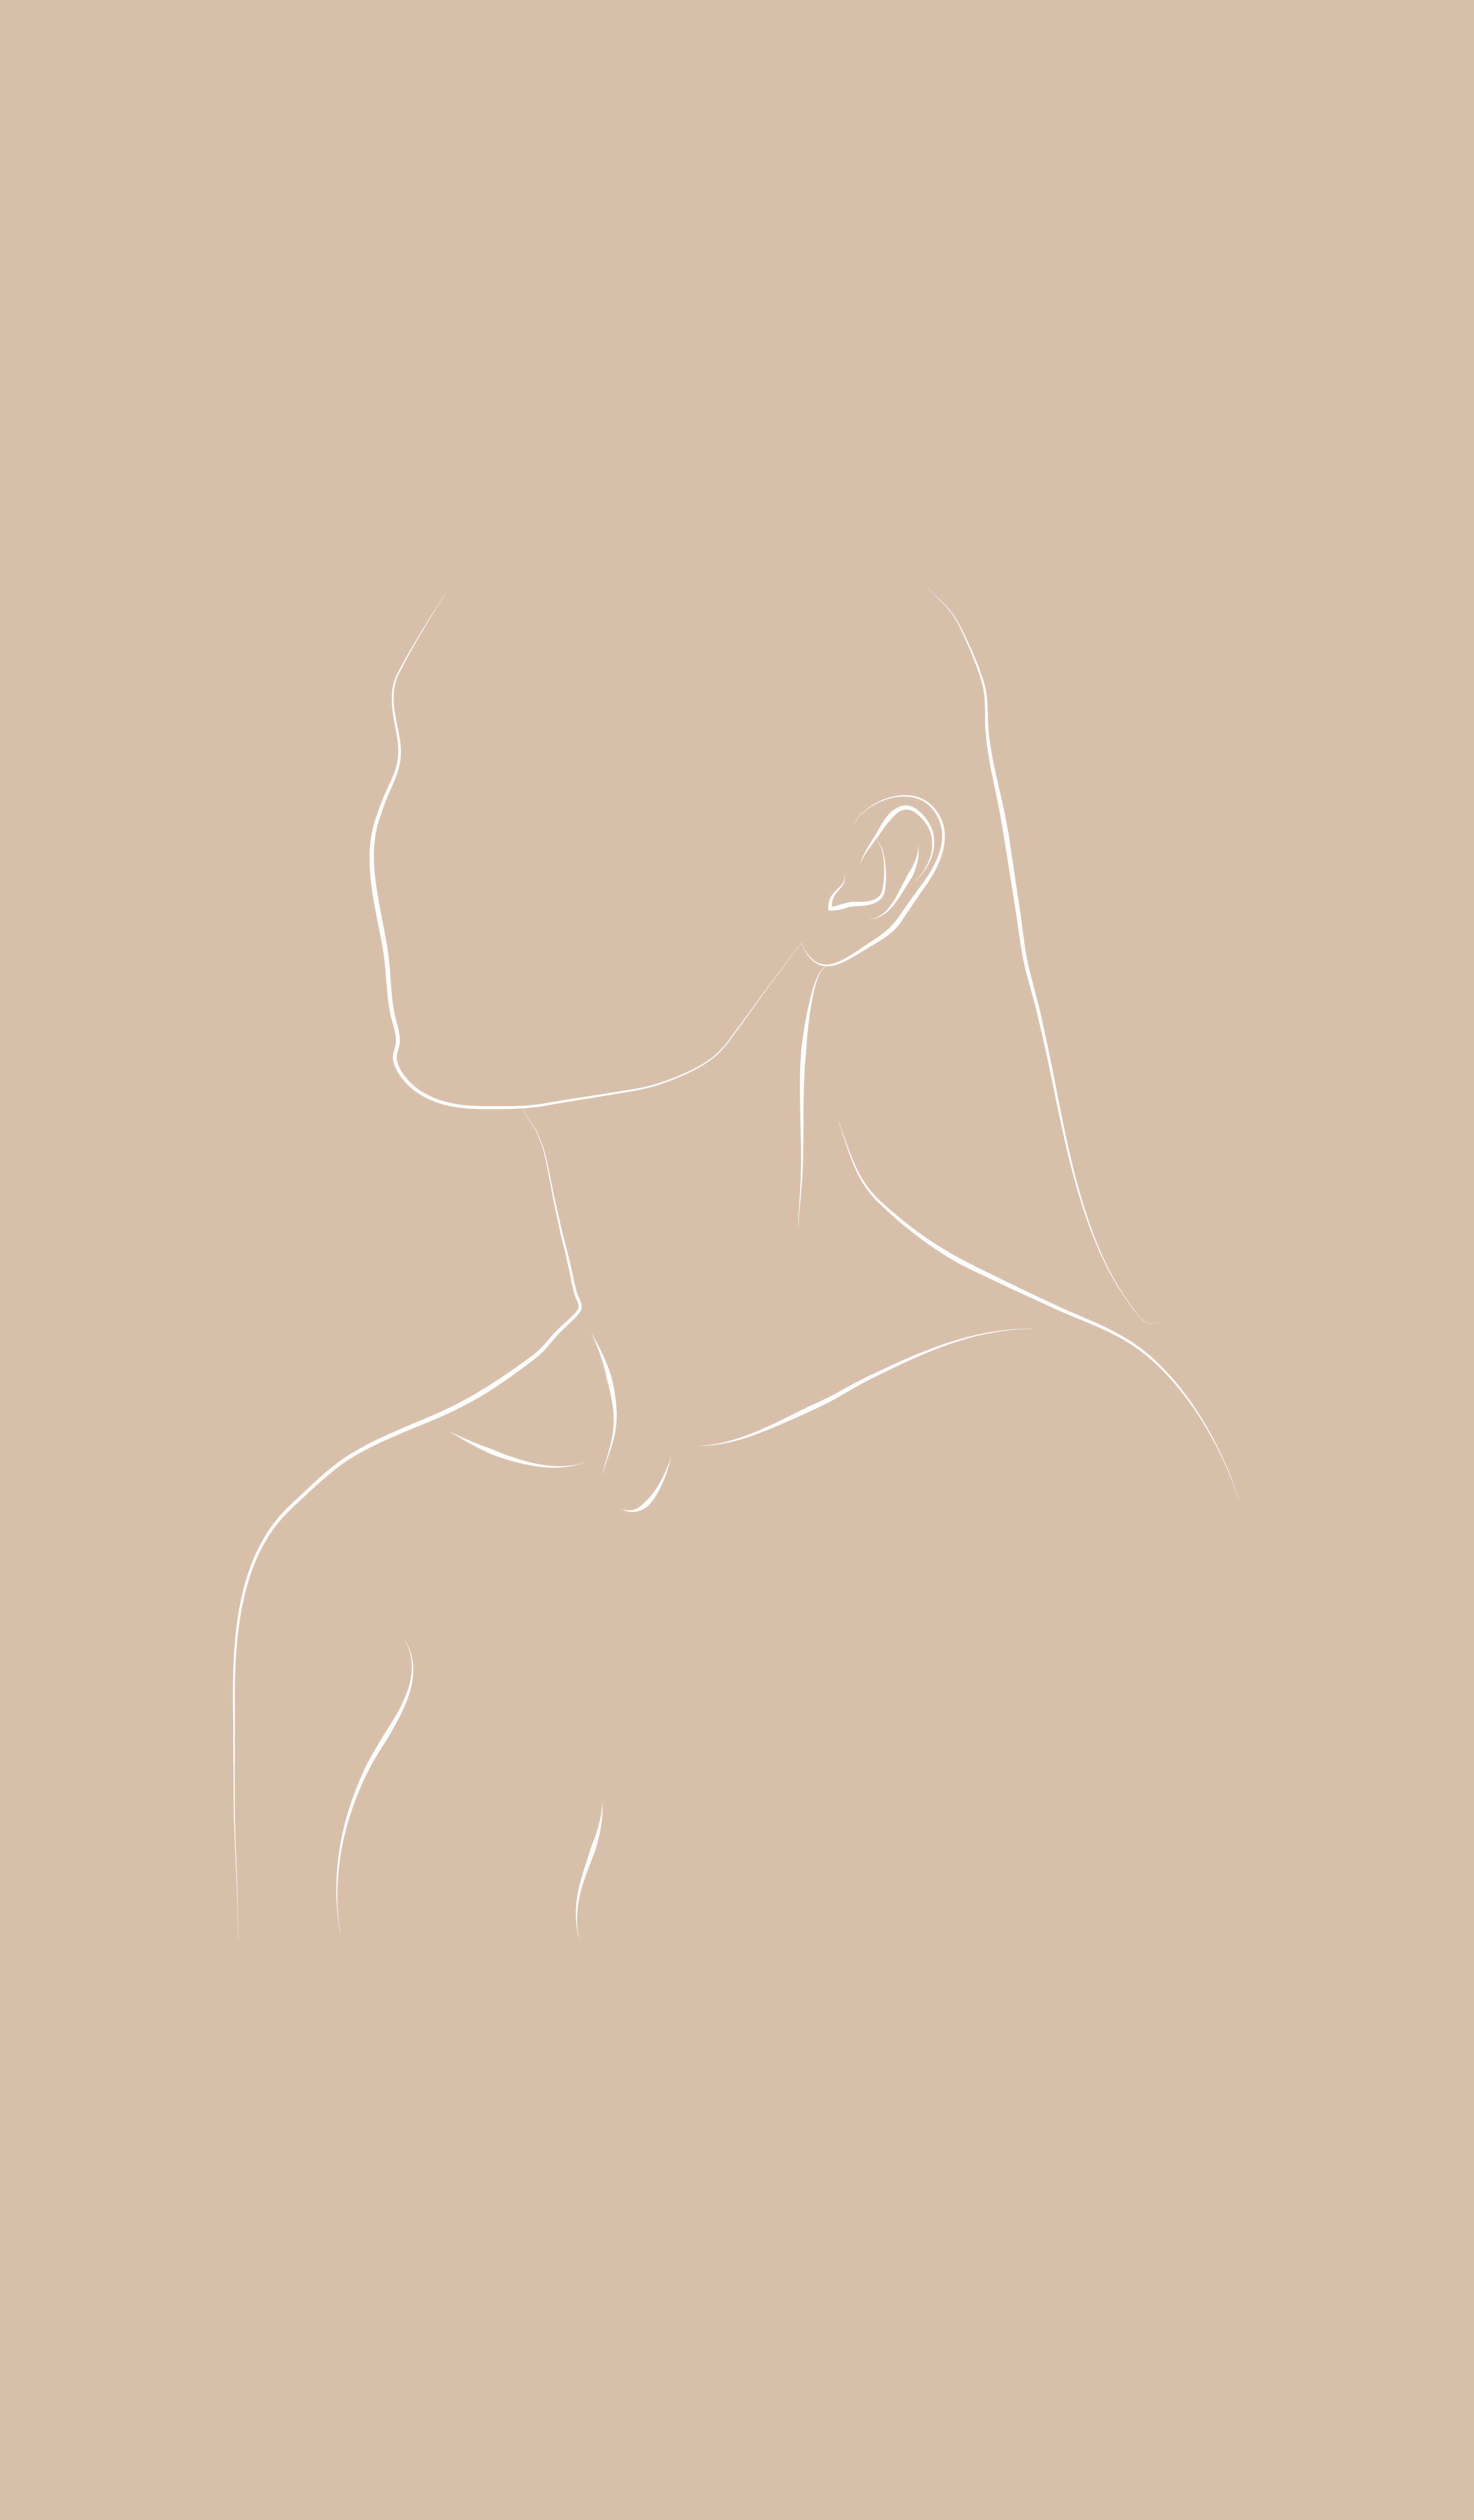 Minimal line portrait | IG: @studioh20 #figure #figurativedrawing #female #femaleform #feminine #line #linedrawing #lineart #silhouette #woman #women #portrait #minimal #body #femalebody #lineportrait #minimalportrait #minimalclothing